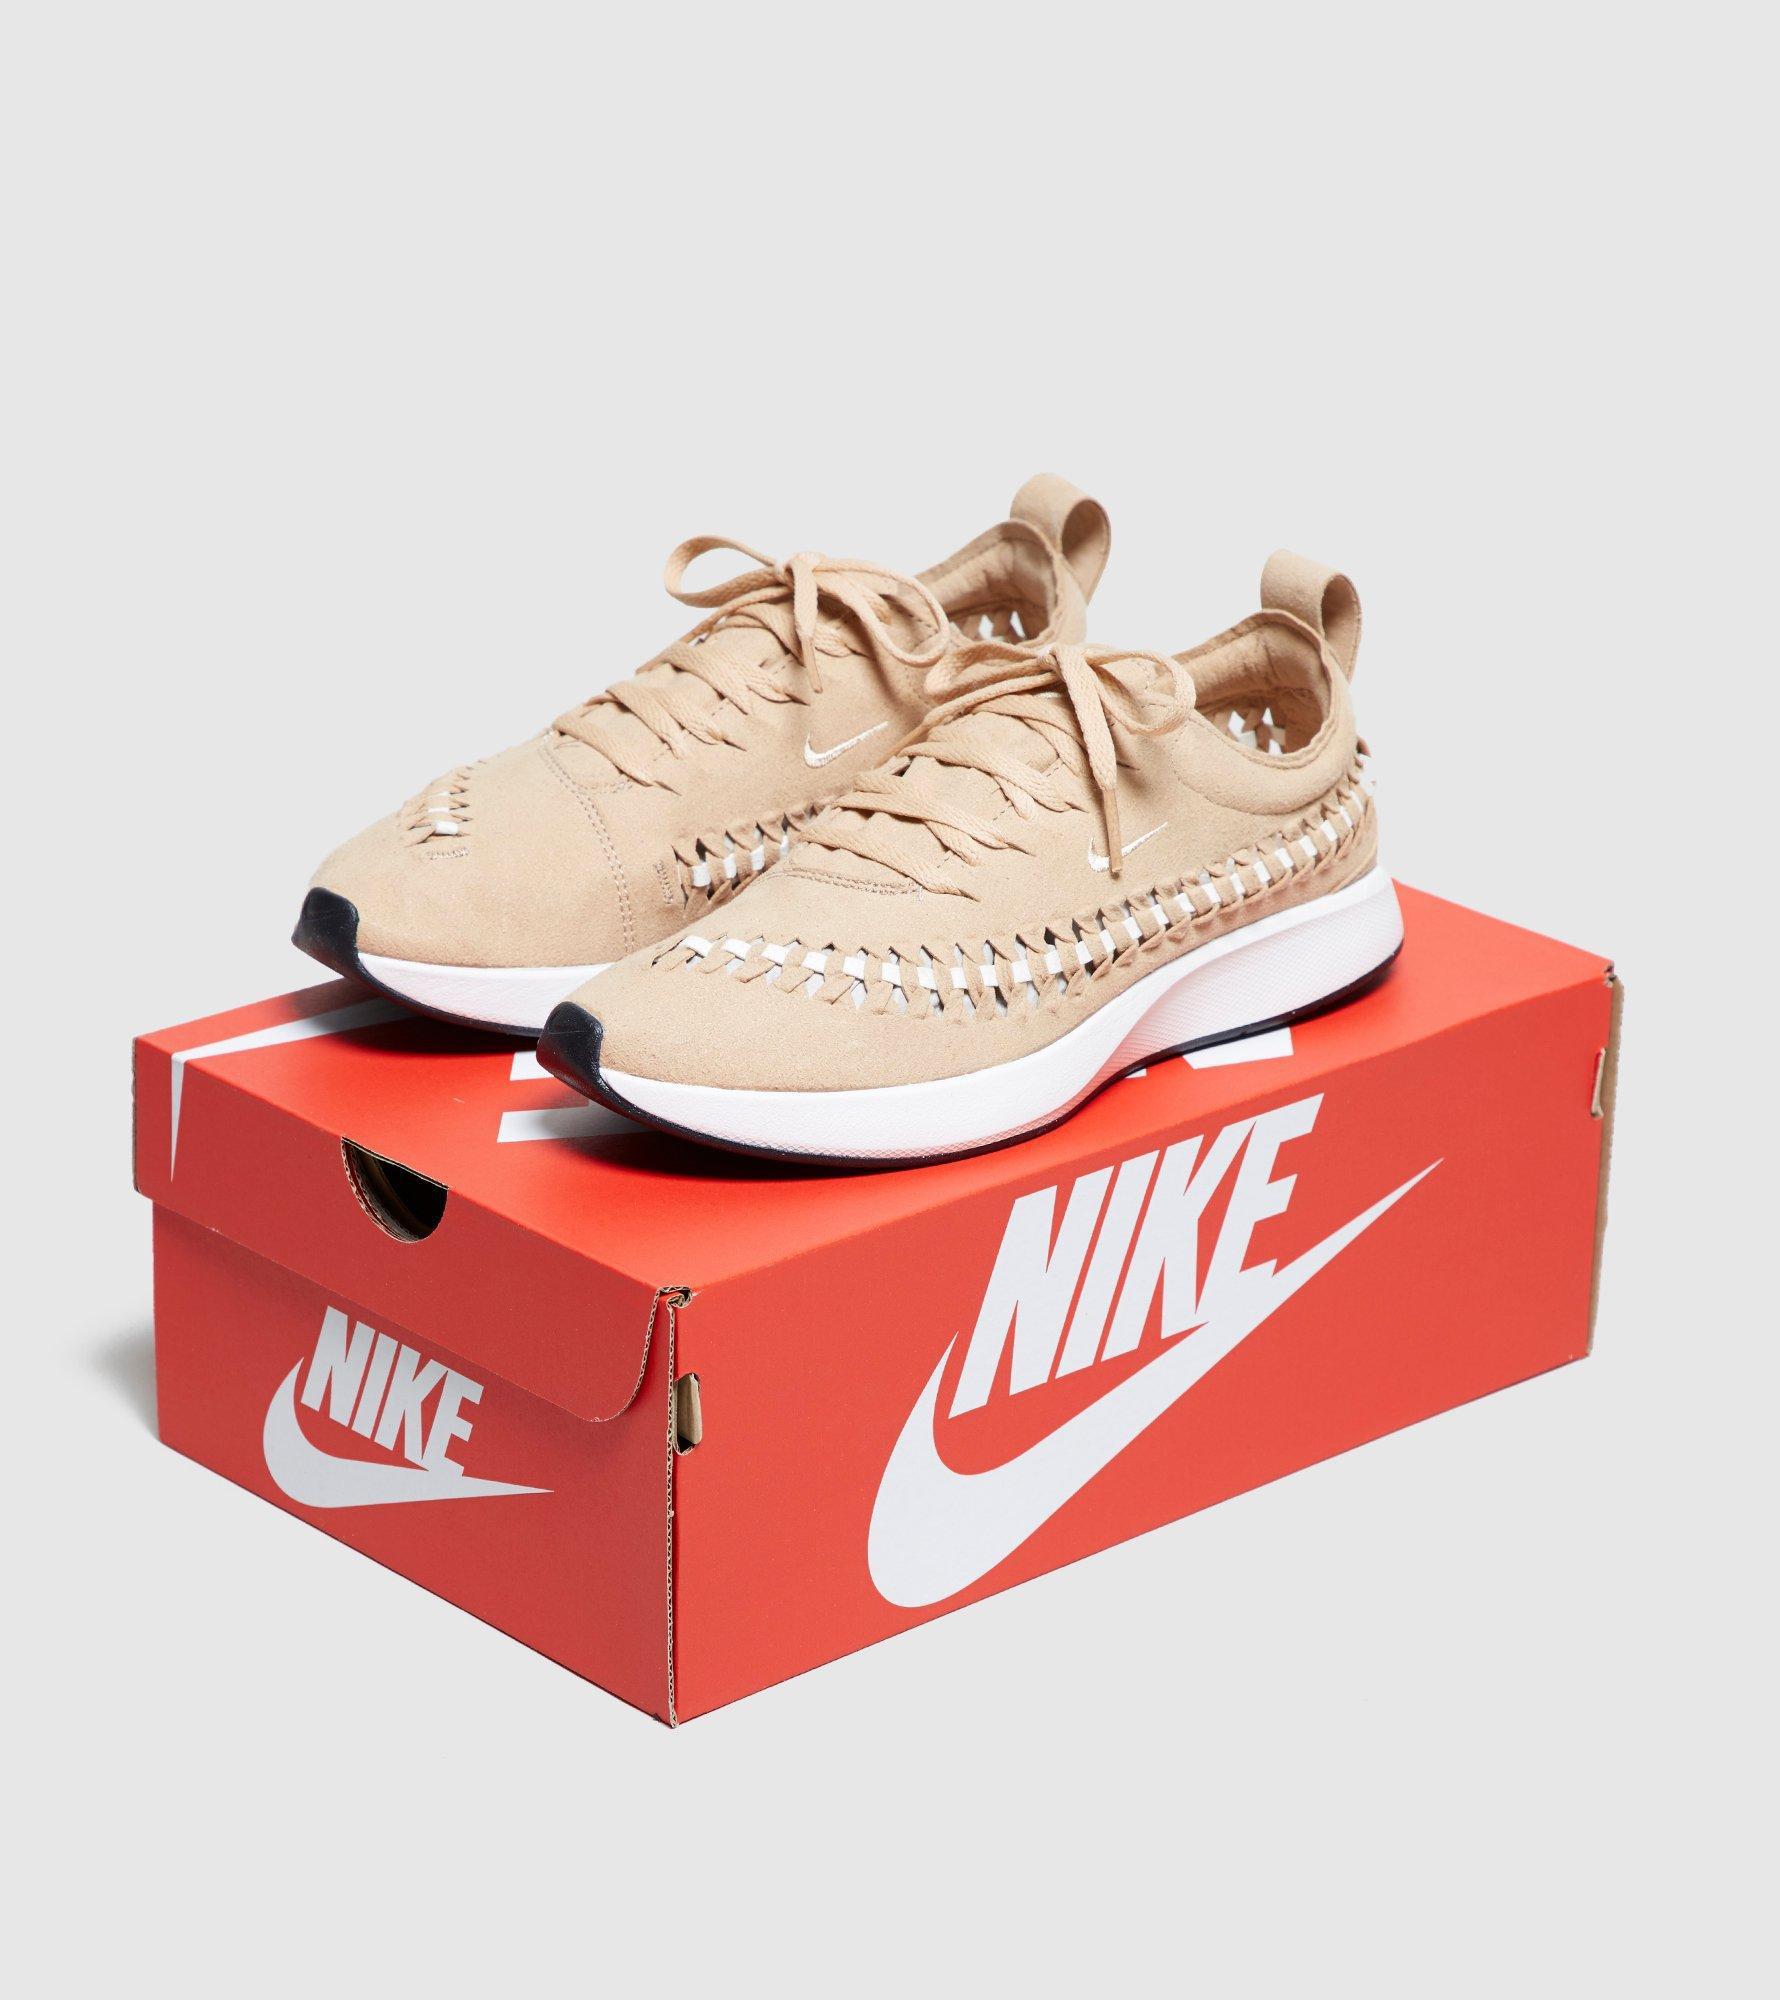 separation shoes 8bfae 34984 Nike Dualtone Racer Woven Women's - Lyst